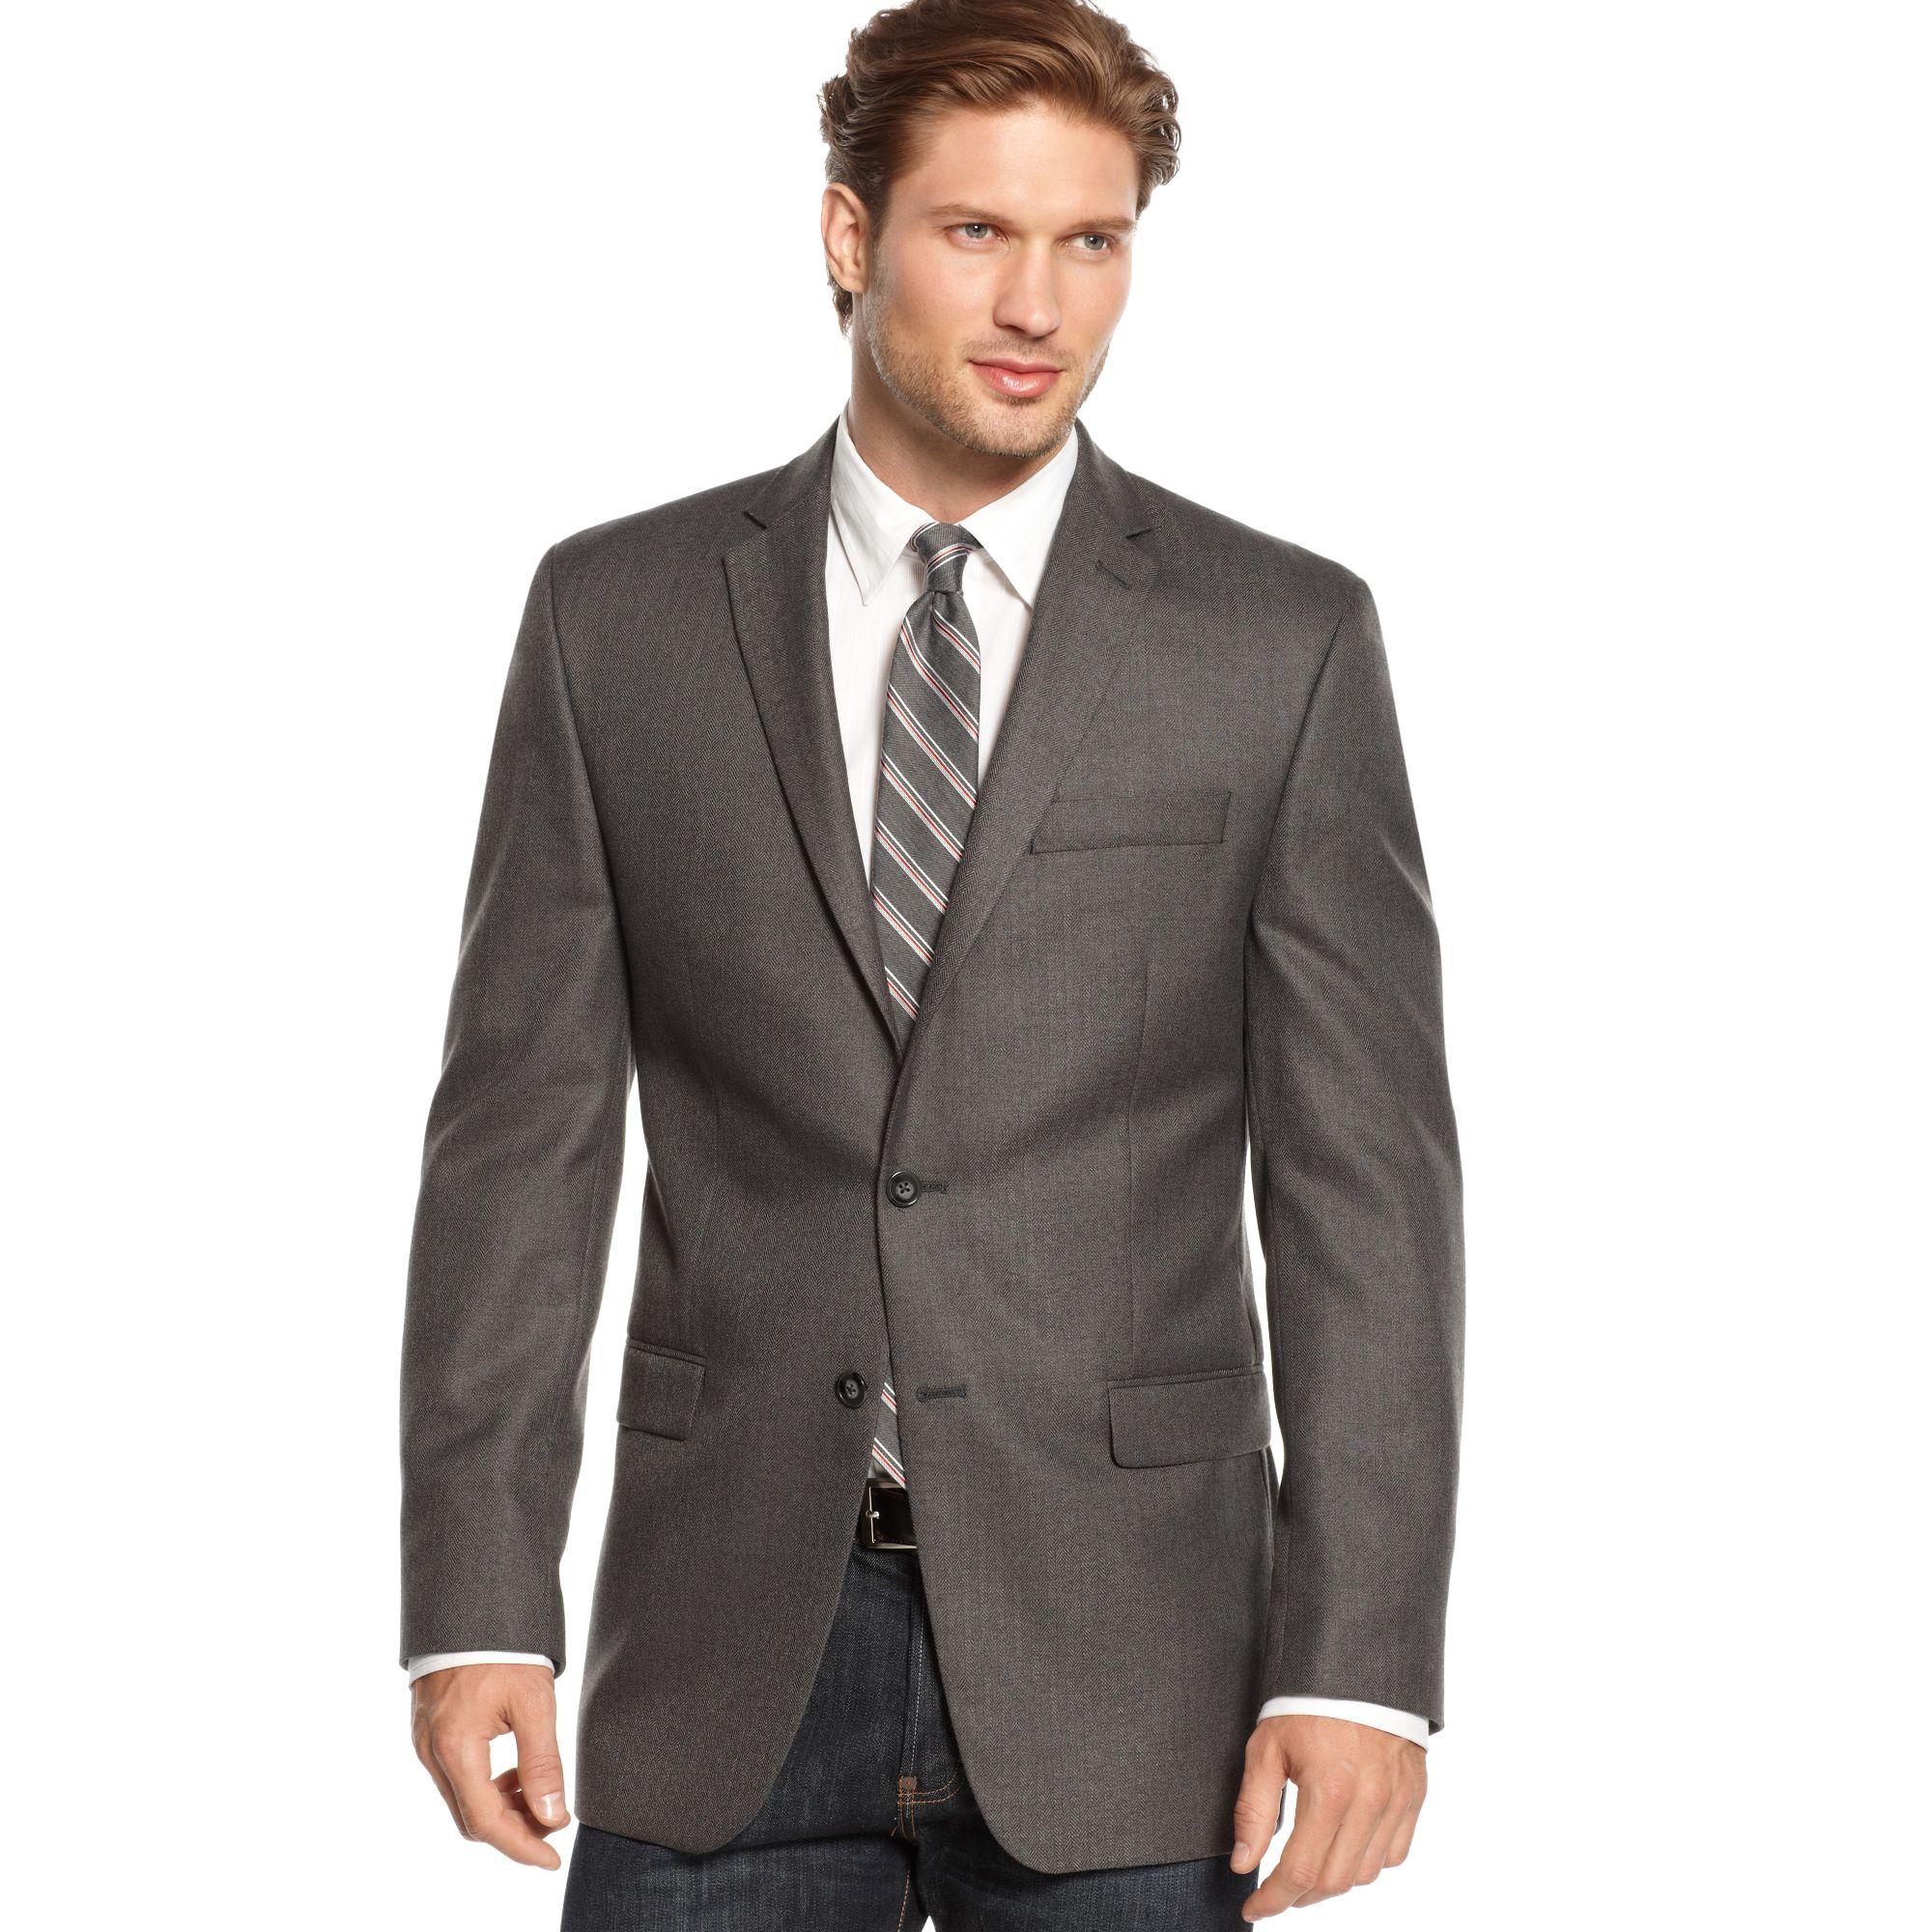 calvin klein herringbone sport coat slim fit big and tall in gray for men grey lyst. Black Bedroom Furniture Sets. Home Design Ideas